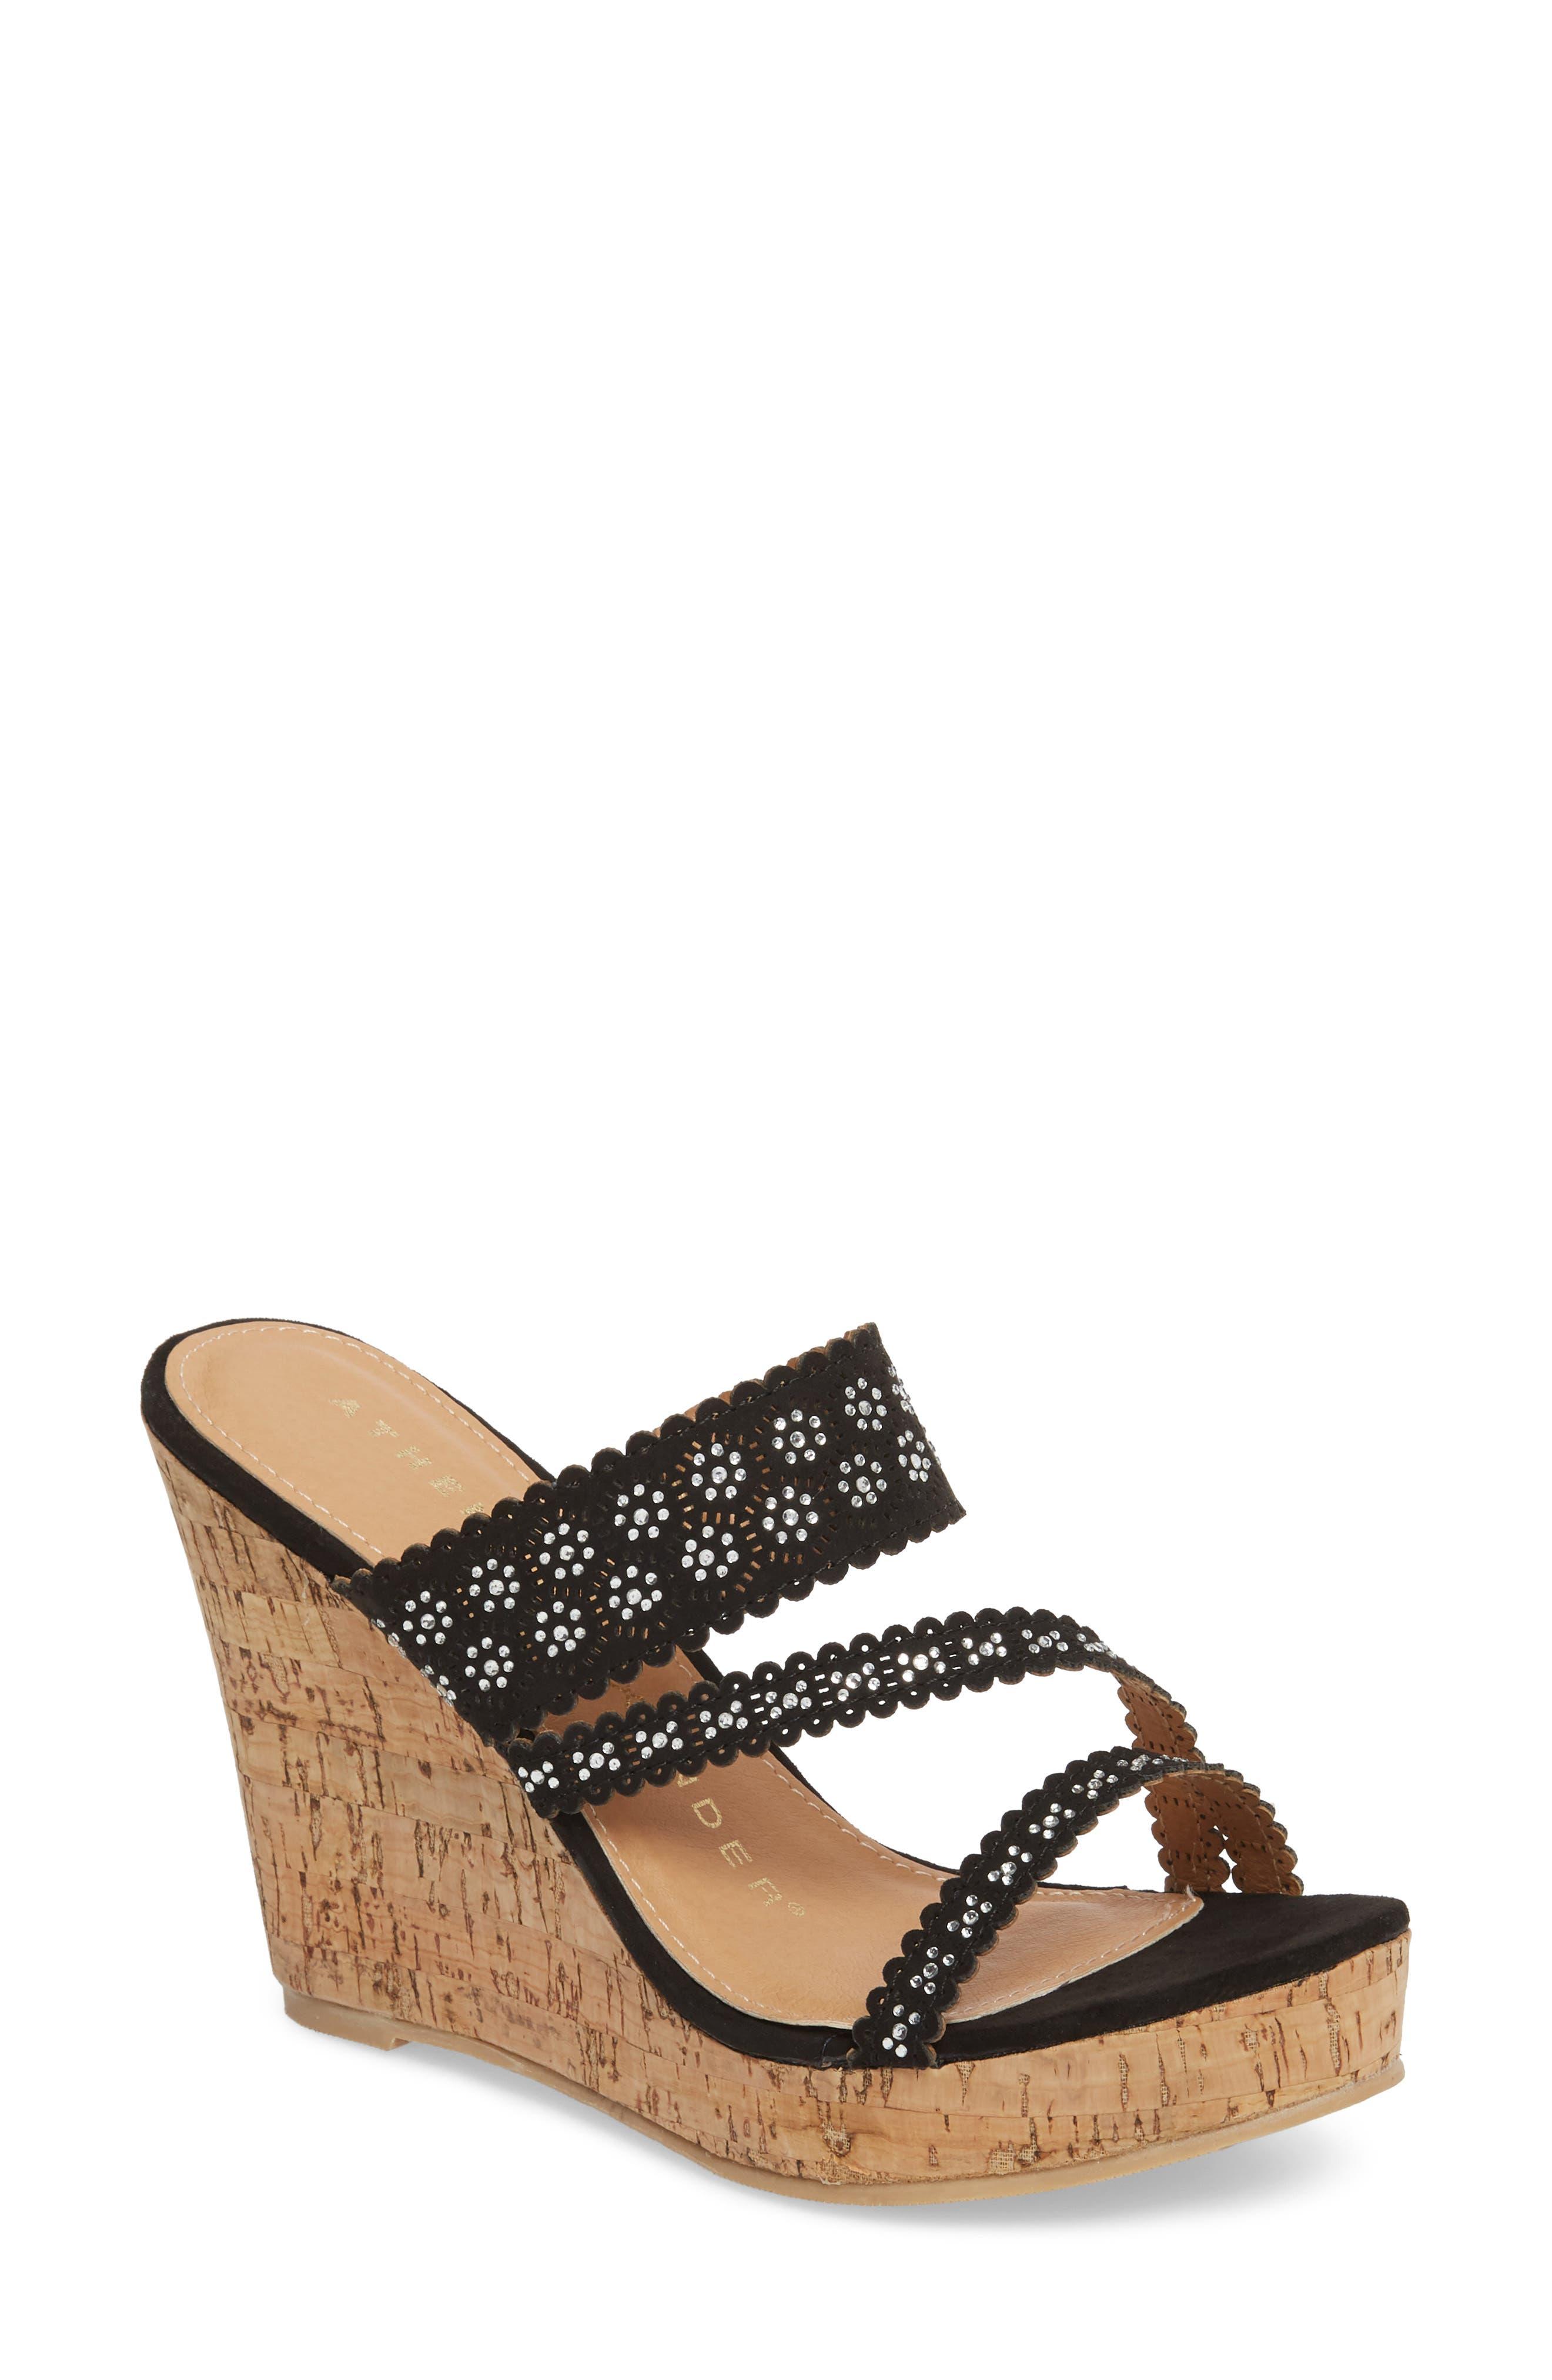 Main Image - Athena Alexander Aerin Embellished Wedge Sandal (Women)